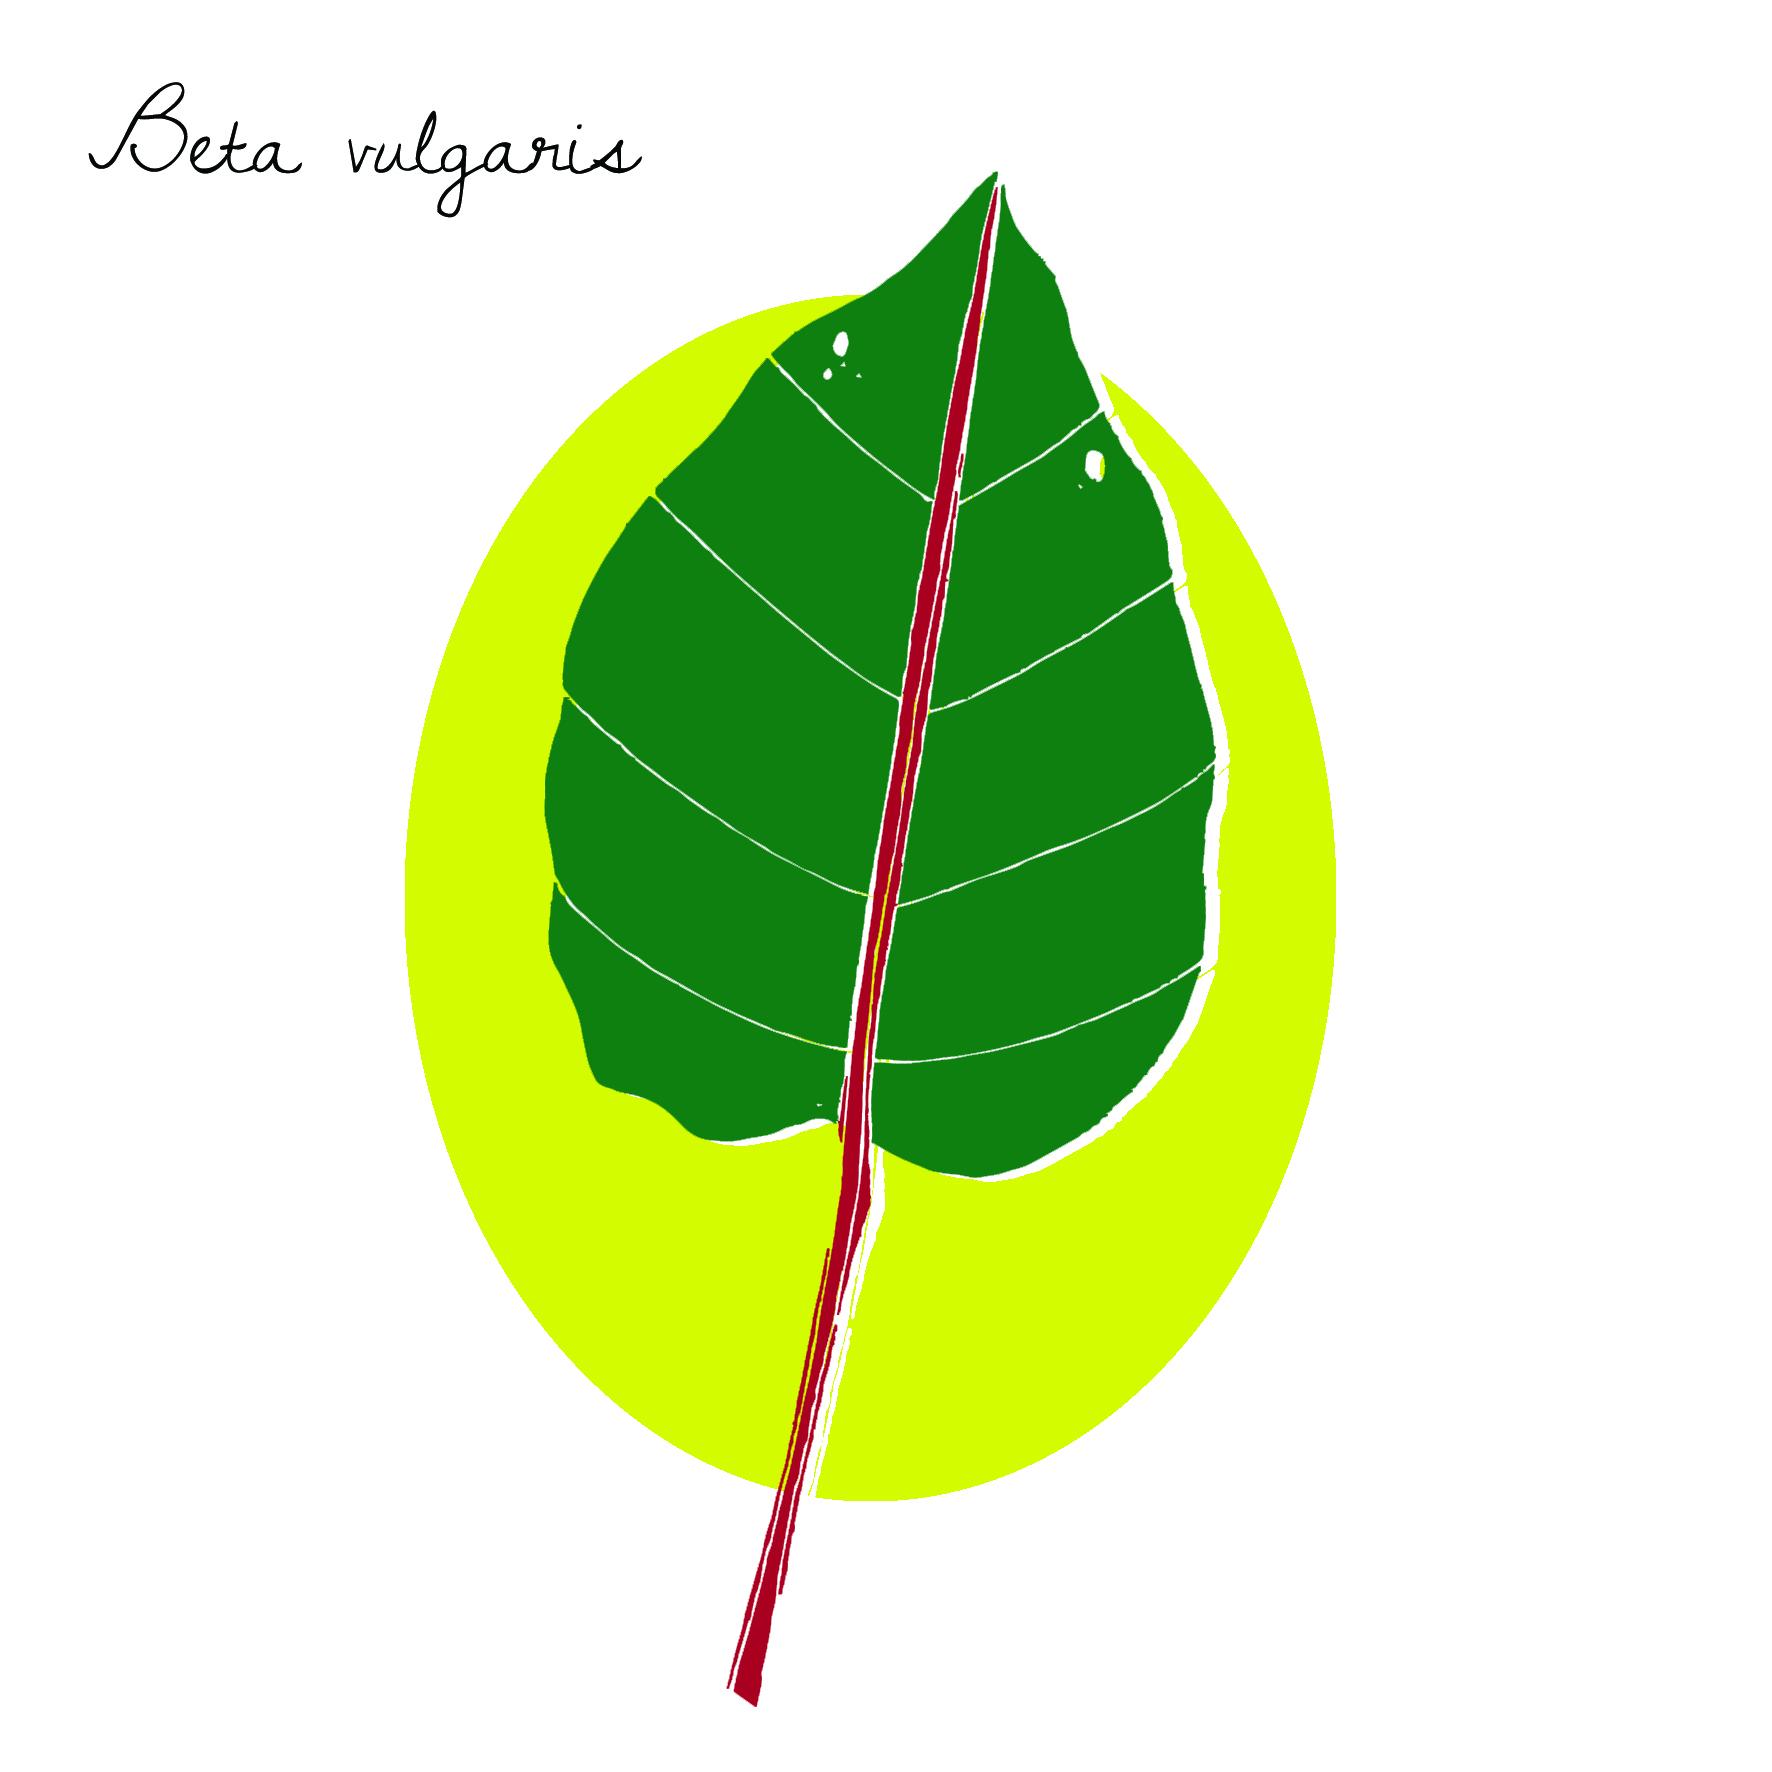 Beta vulgaris by Virginia Elena Patrone